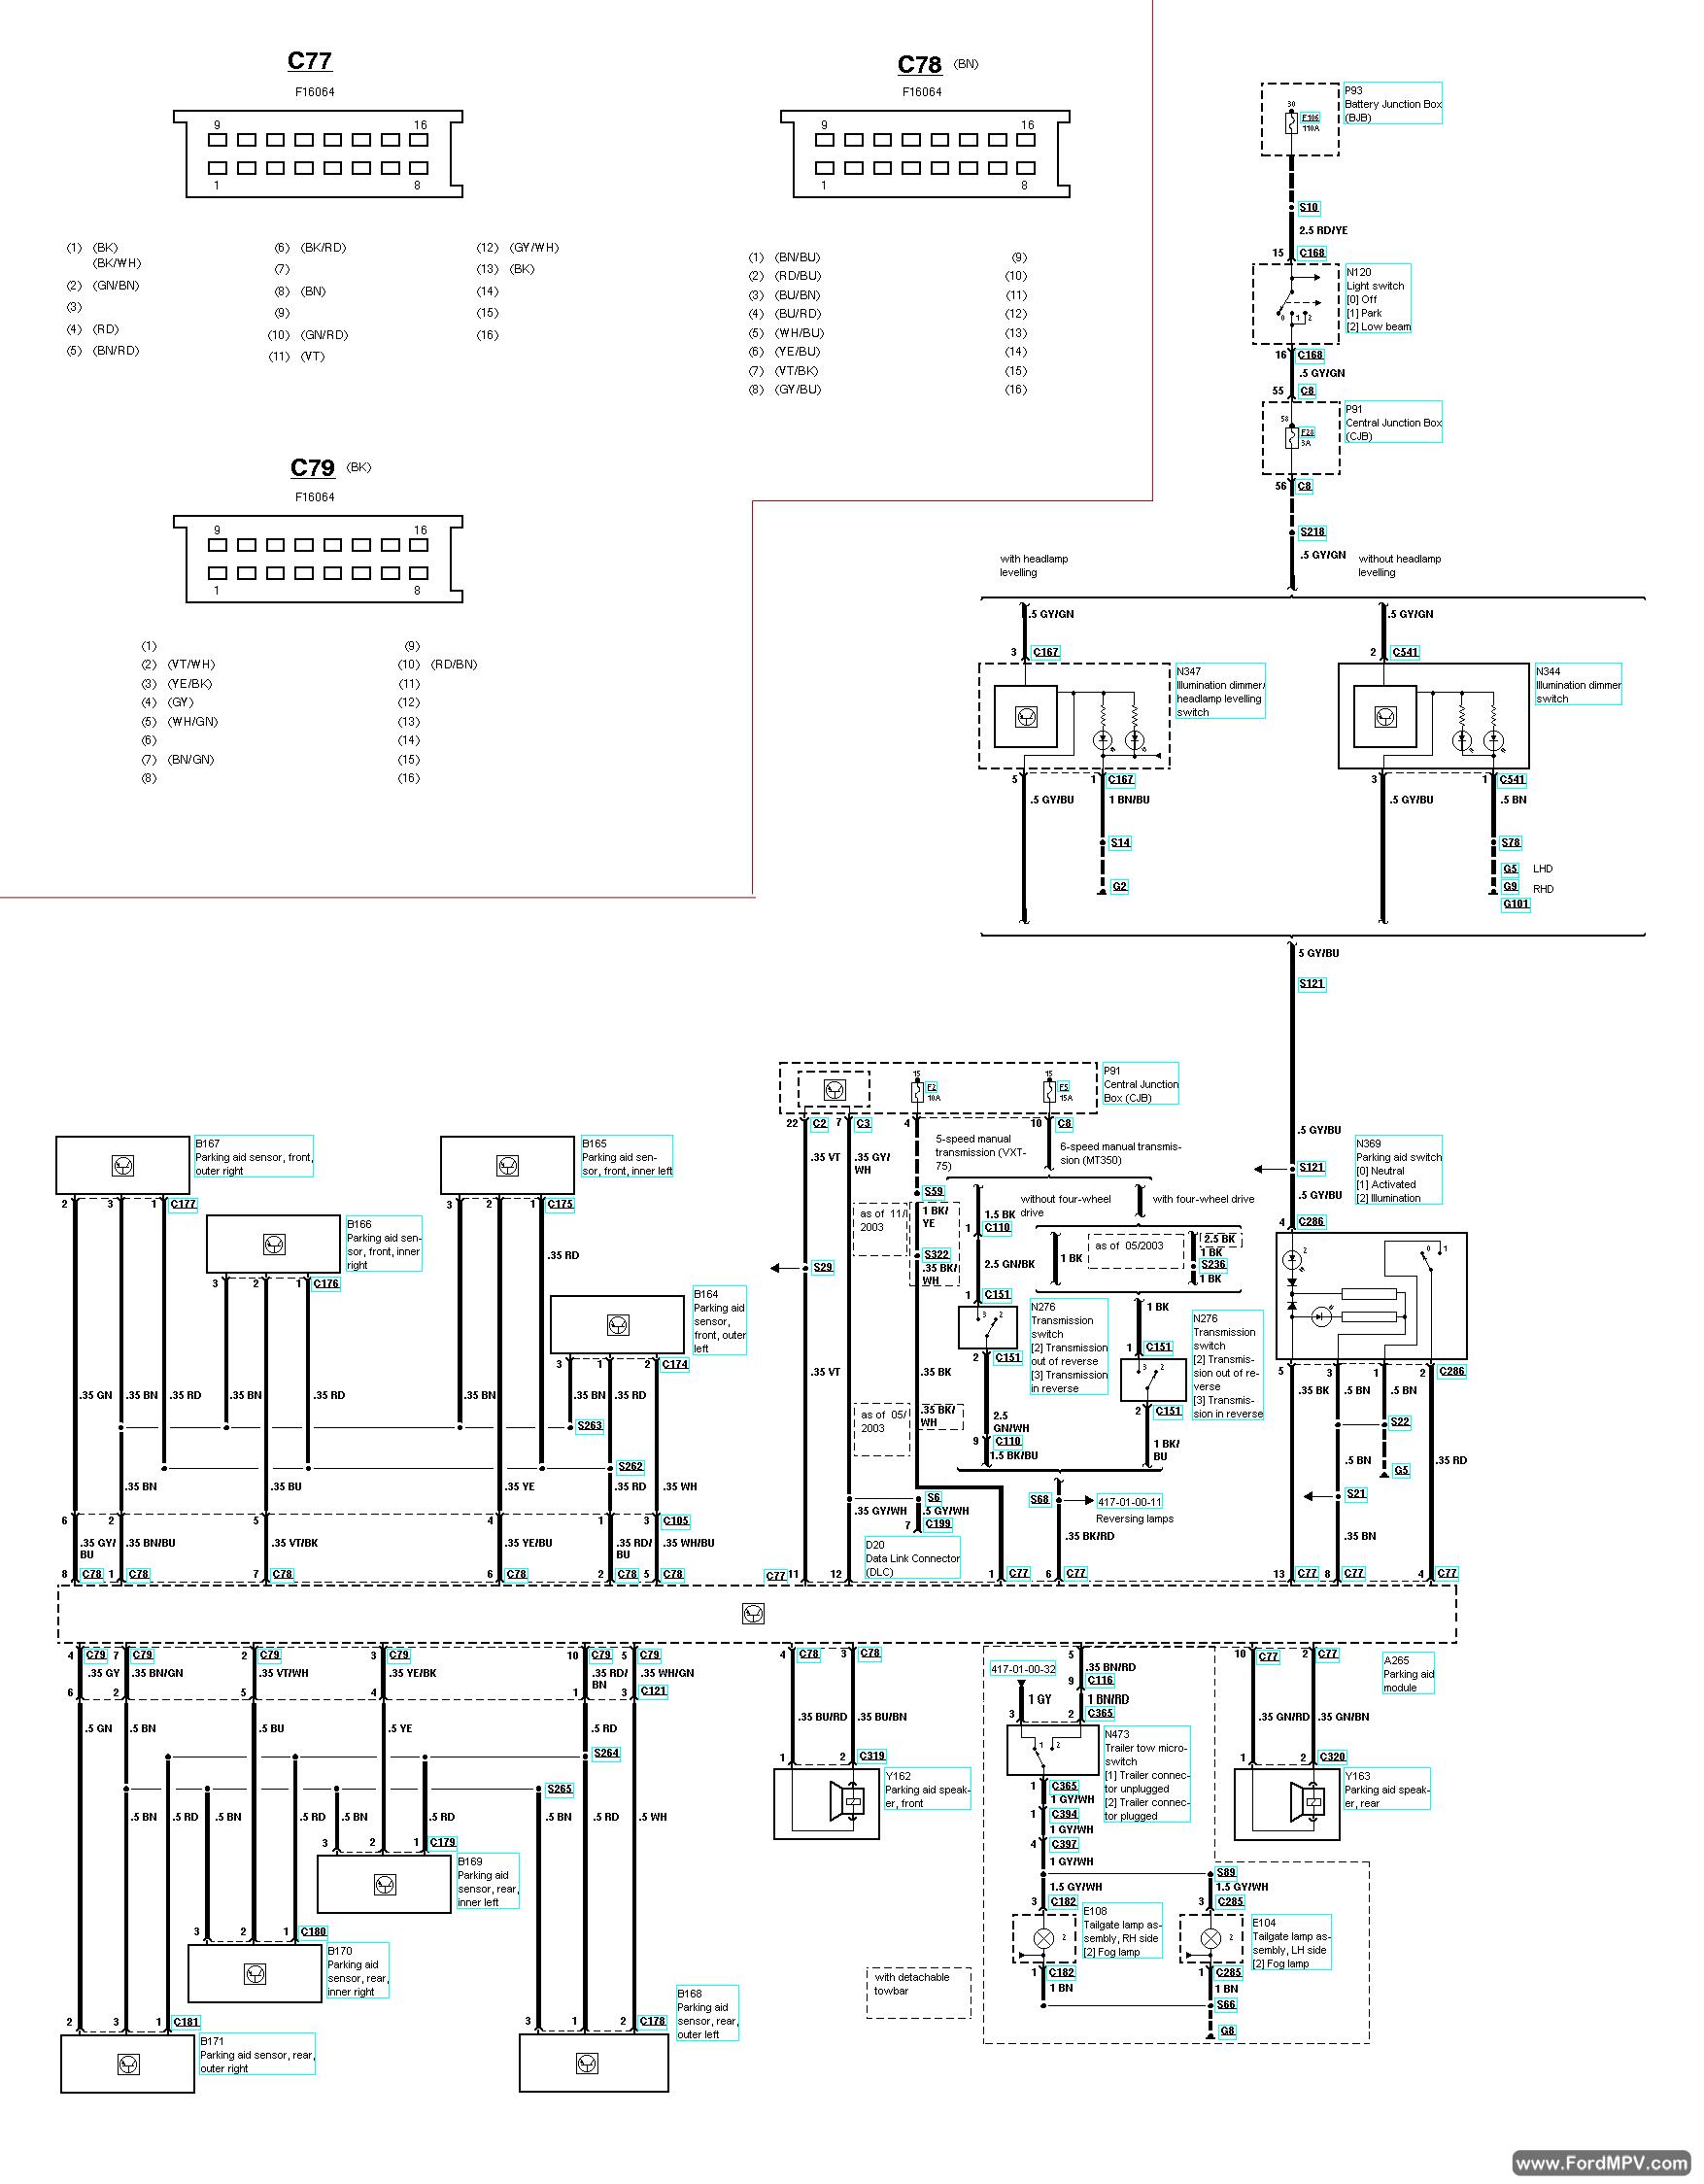 Vw Sharan Wiring Diagram Pdf - Fax For Phone Jack Wiring Diagram -  audi-a3.bmw-in-e46.jeanjaures37.frWiring Diagram Resource